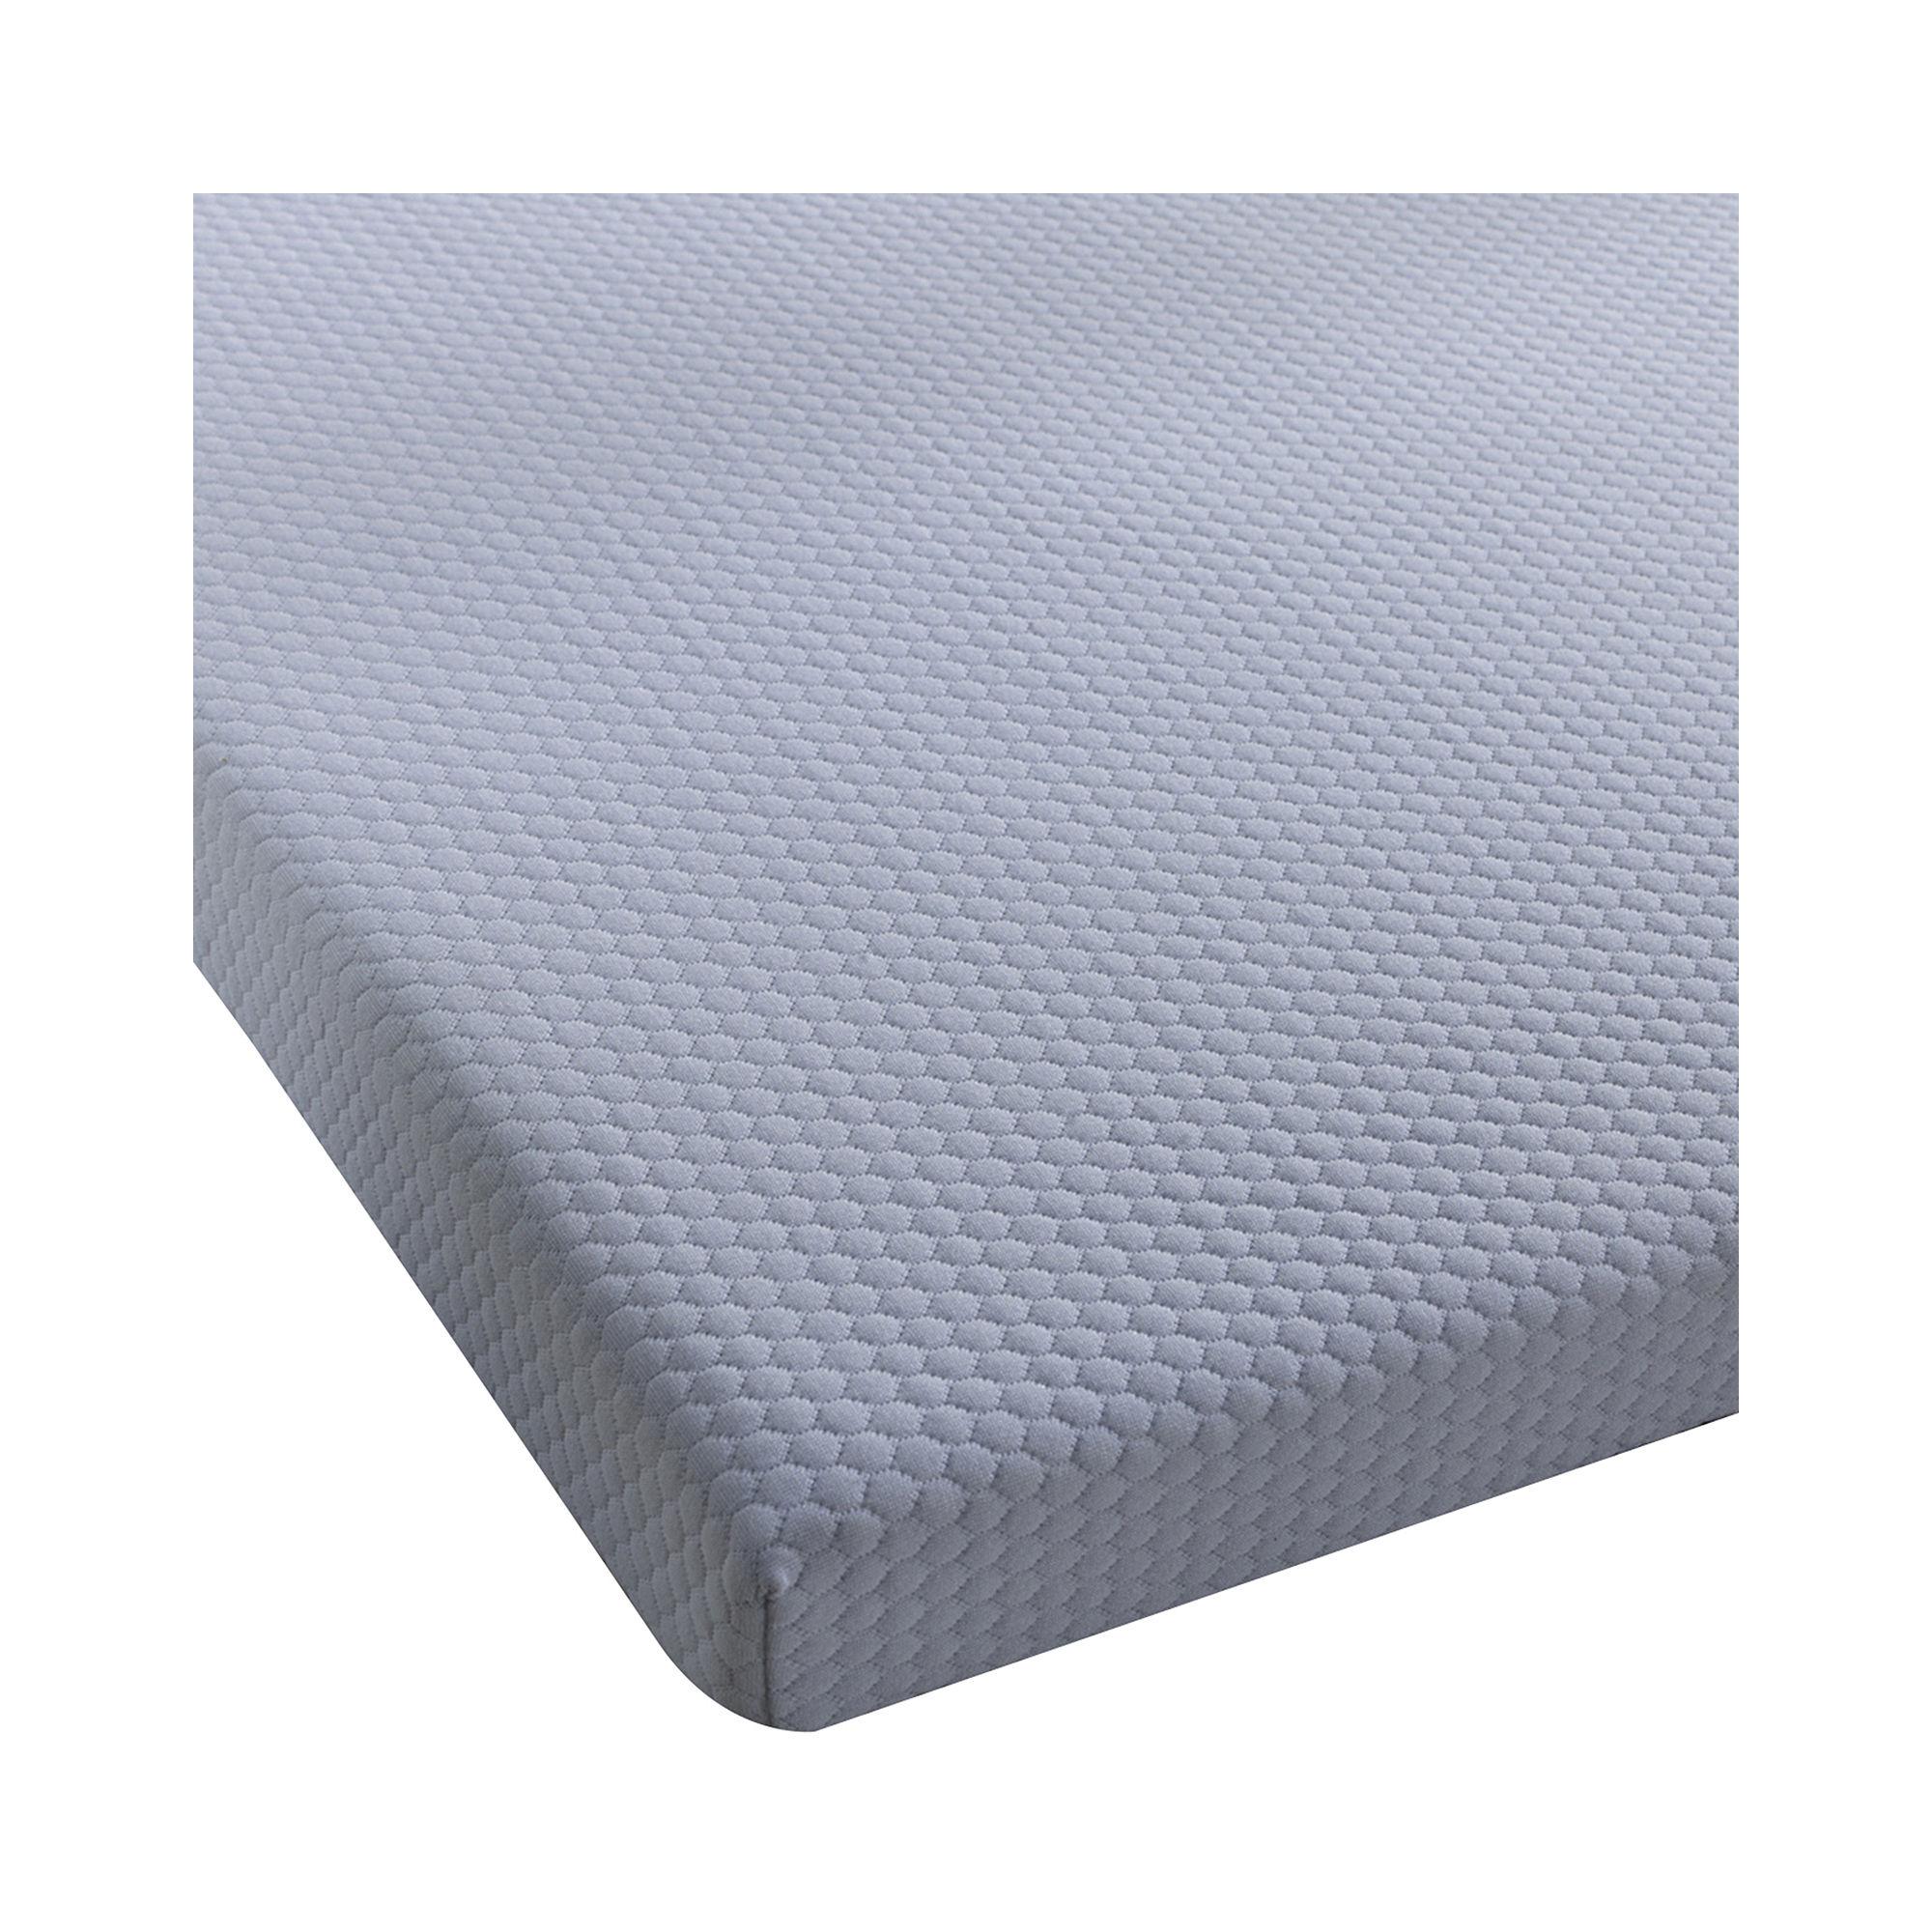 Memory Foam Pad For Bed Mattress Pad Guide Solid Foam Mattress Euroluxury 5 Layer Memory Foam